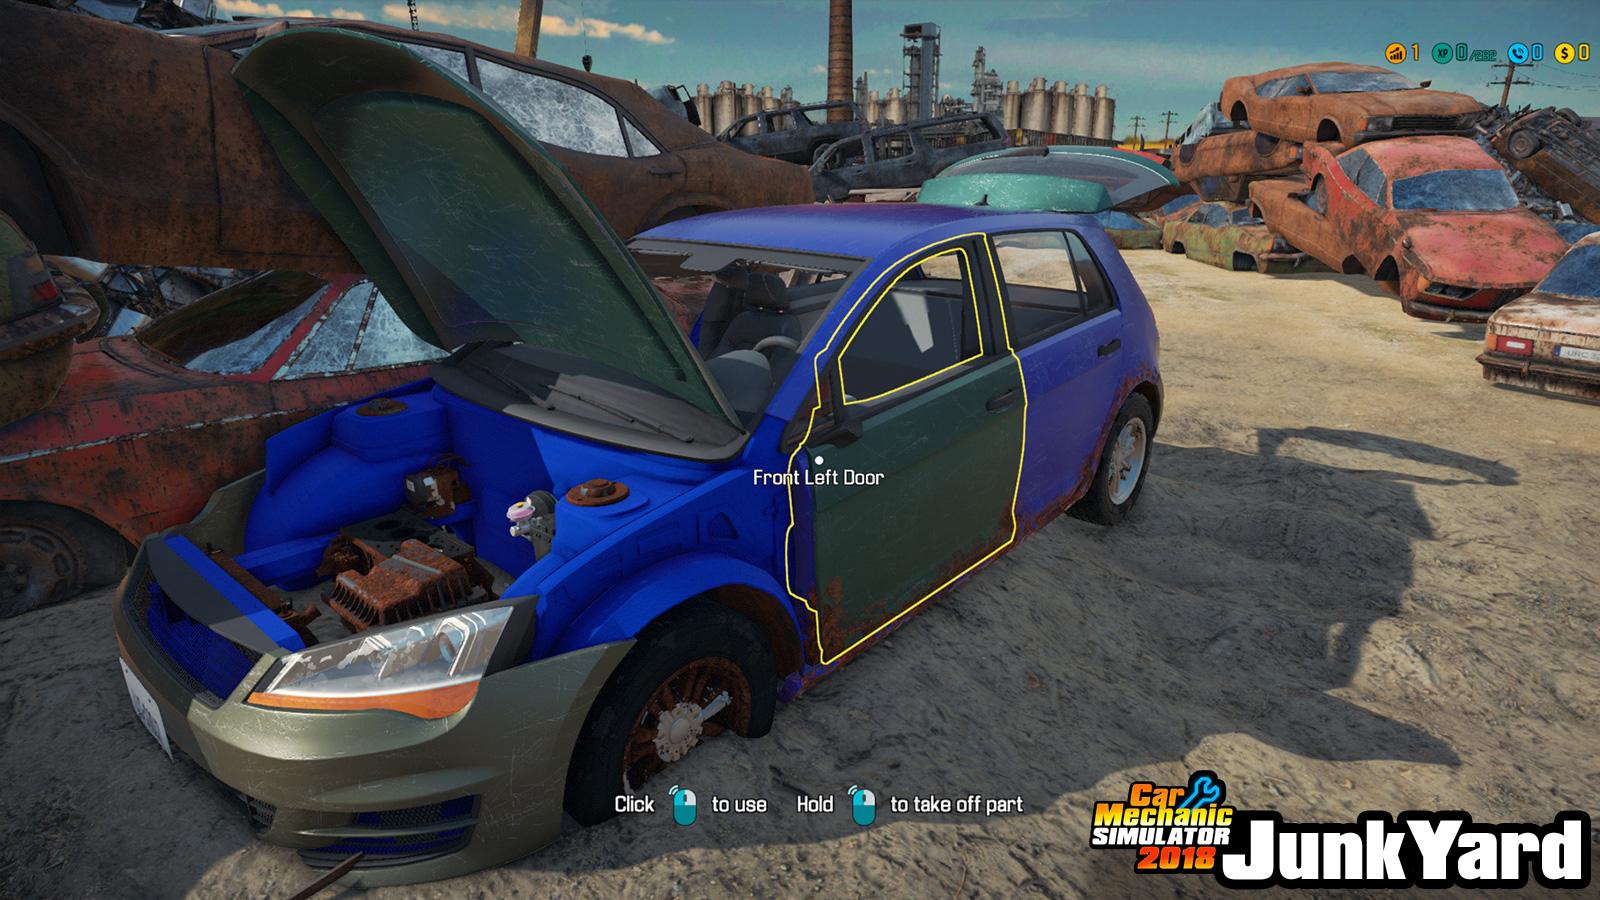 Car Mechanic Simulator 2018 [v 1.0.2 + 2 DLC] (2017) PC RePack скачать торрент с rutor org